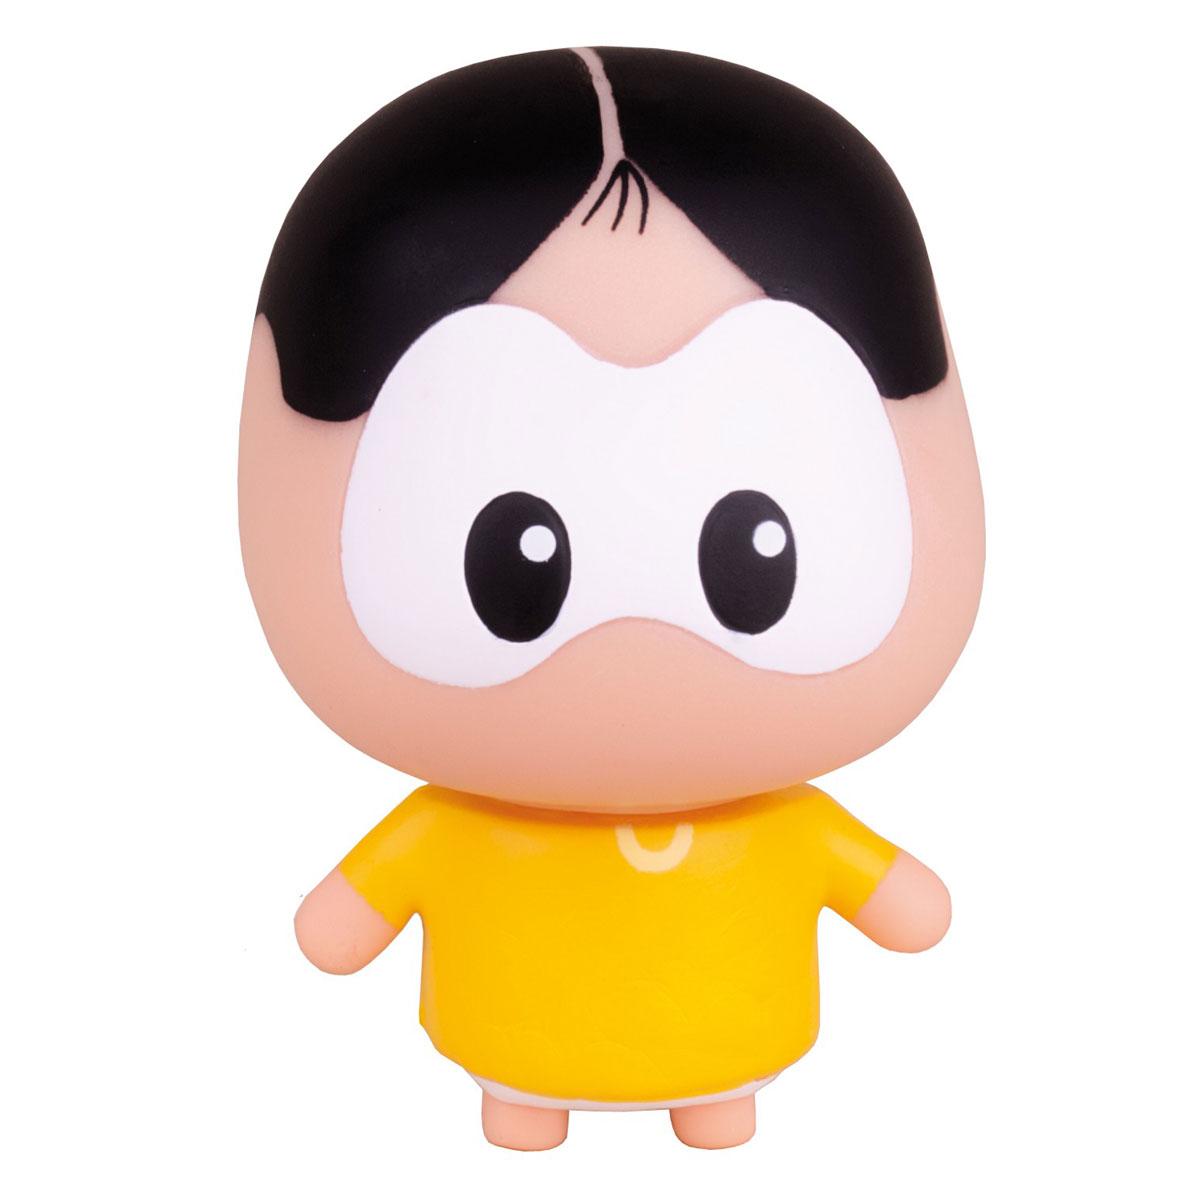 Boneco Turma da Mônica Toy Art Magali